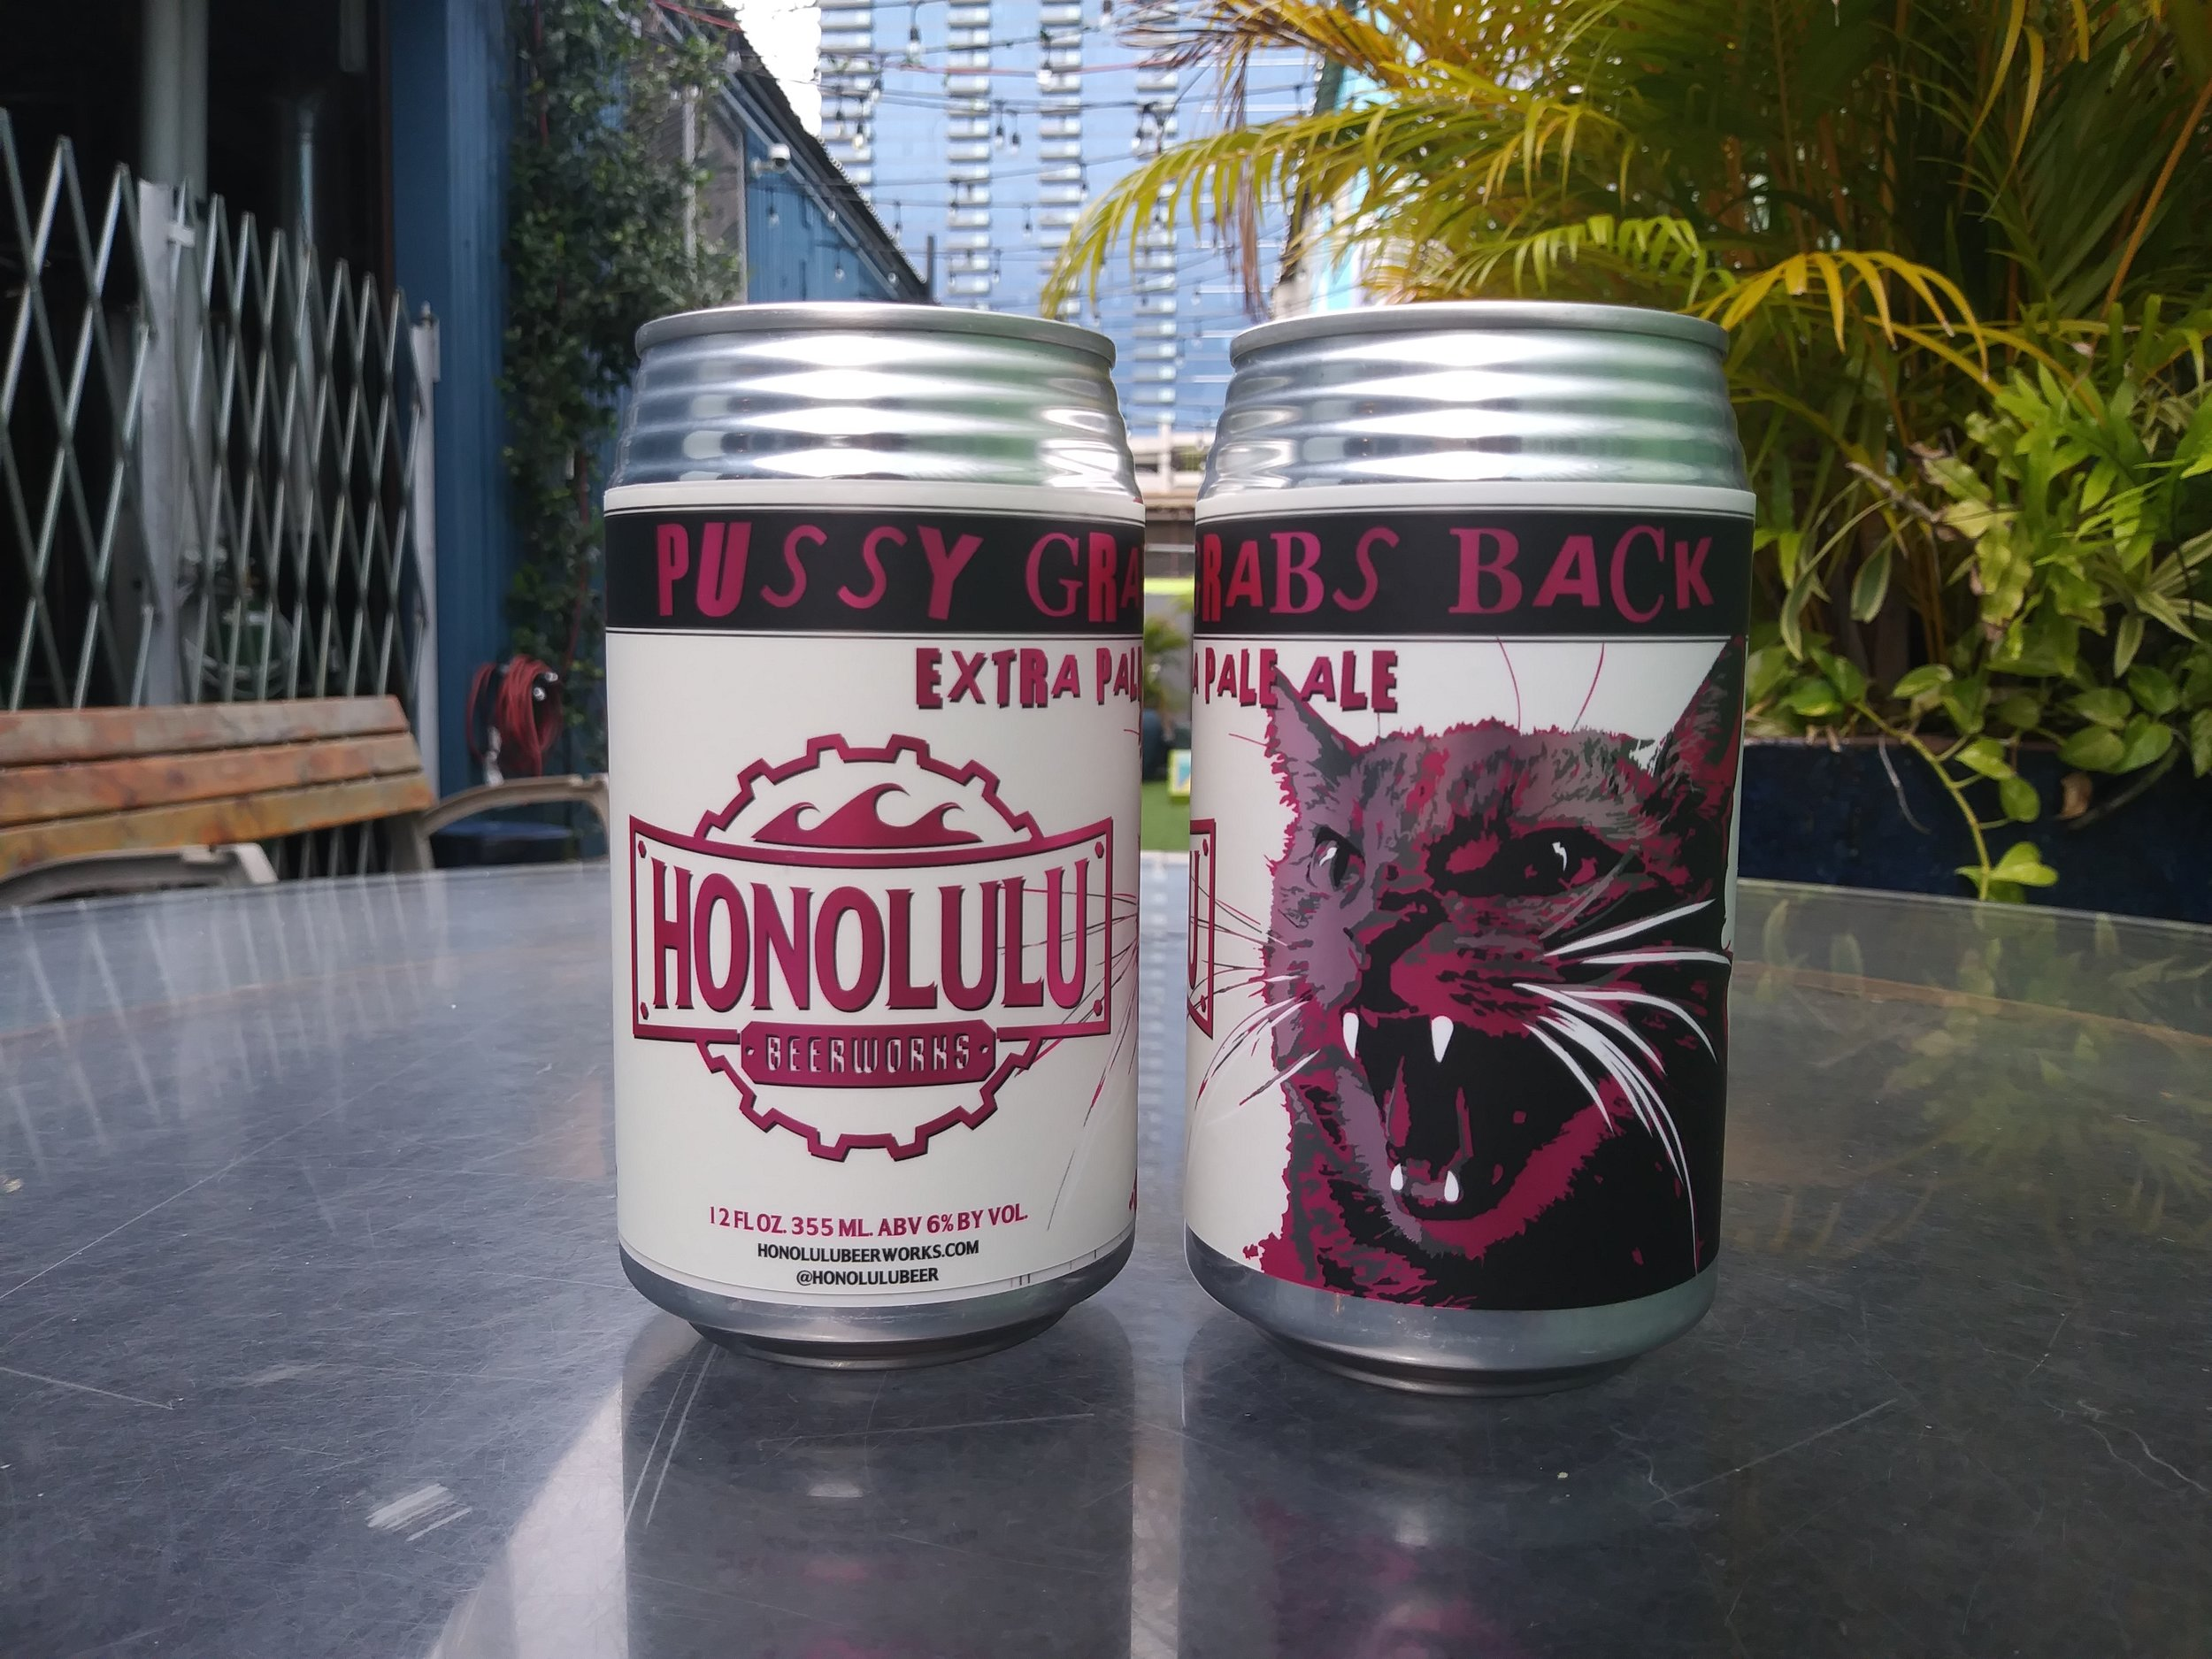 Image via Honolulu Beerworks